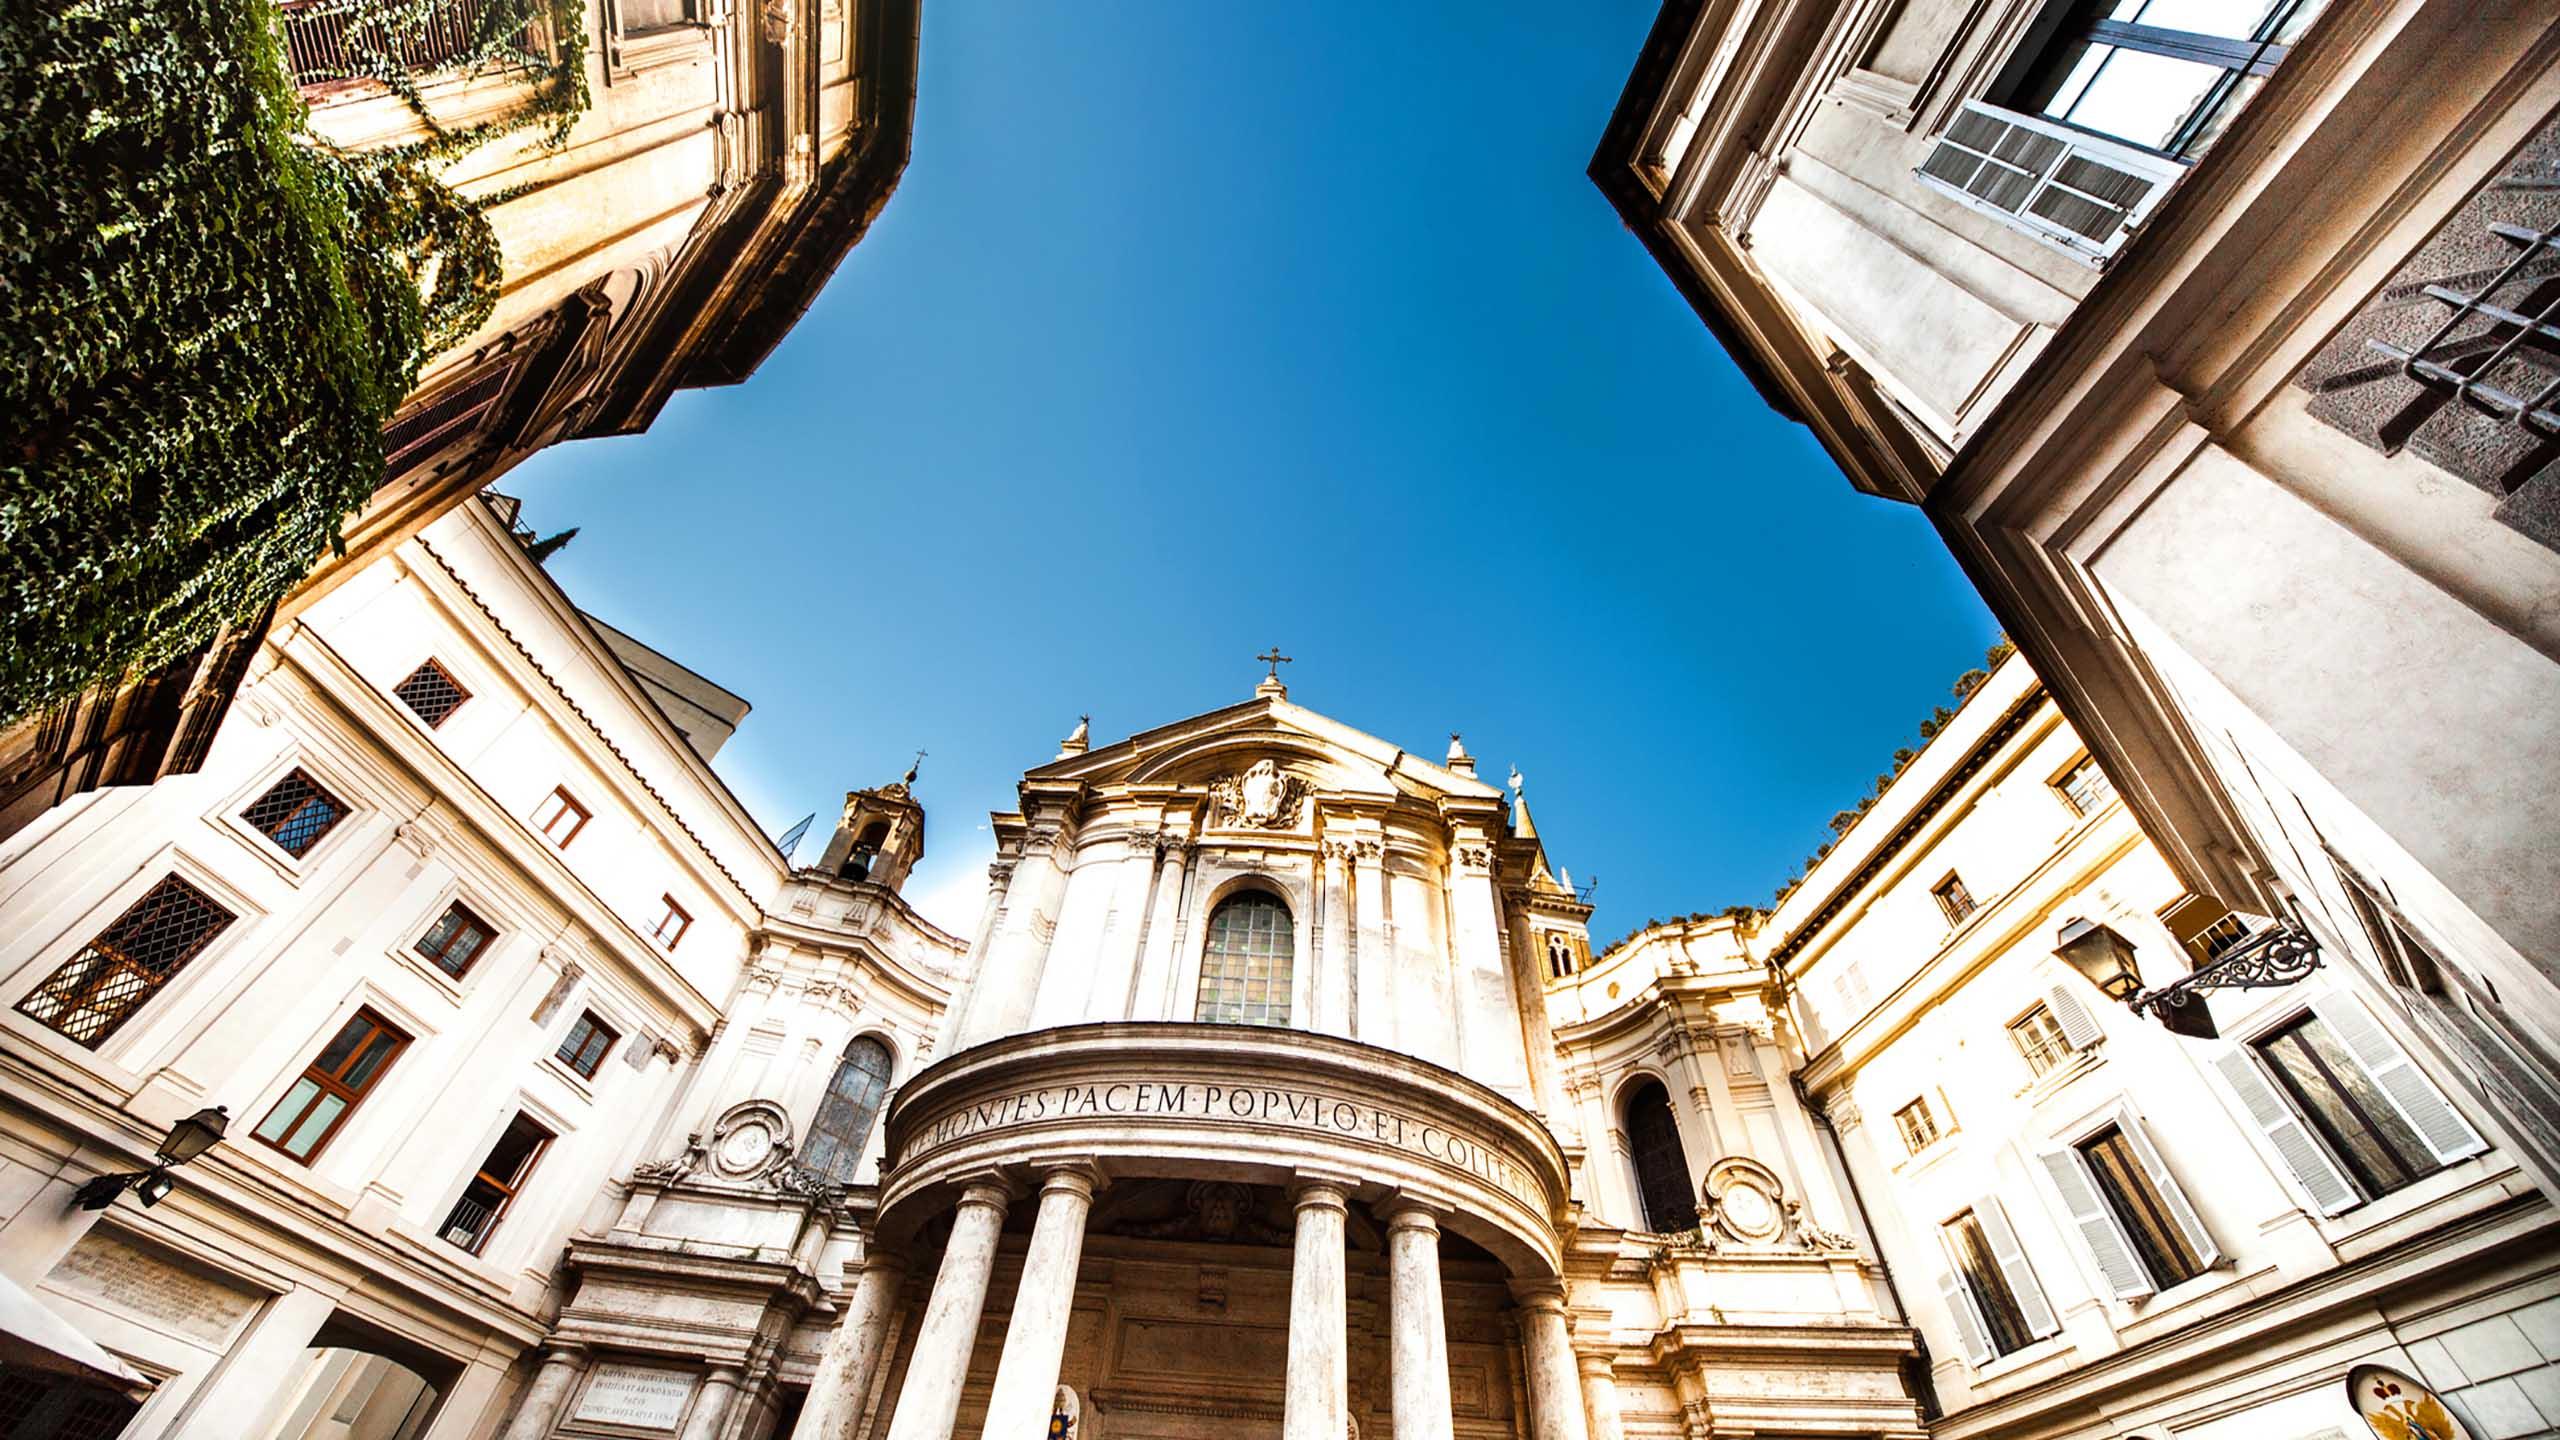 Santa-Maria-della-Pace.jpg